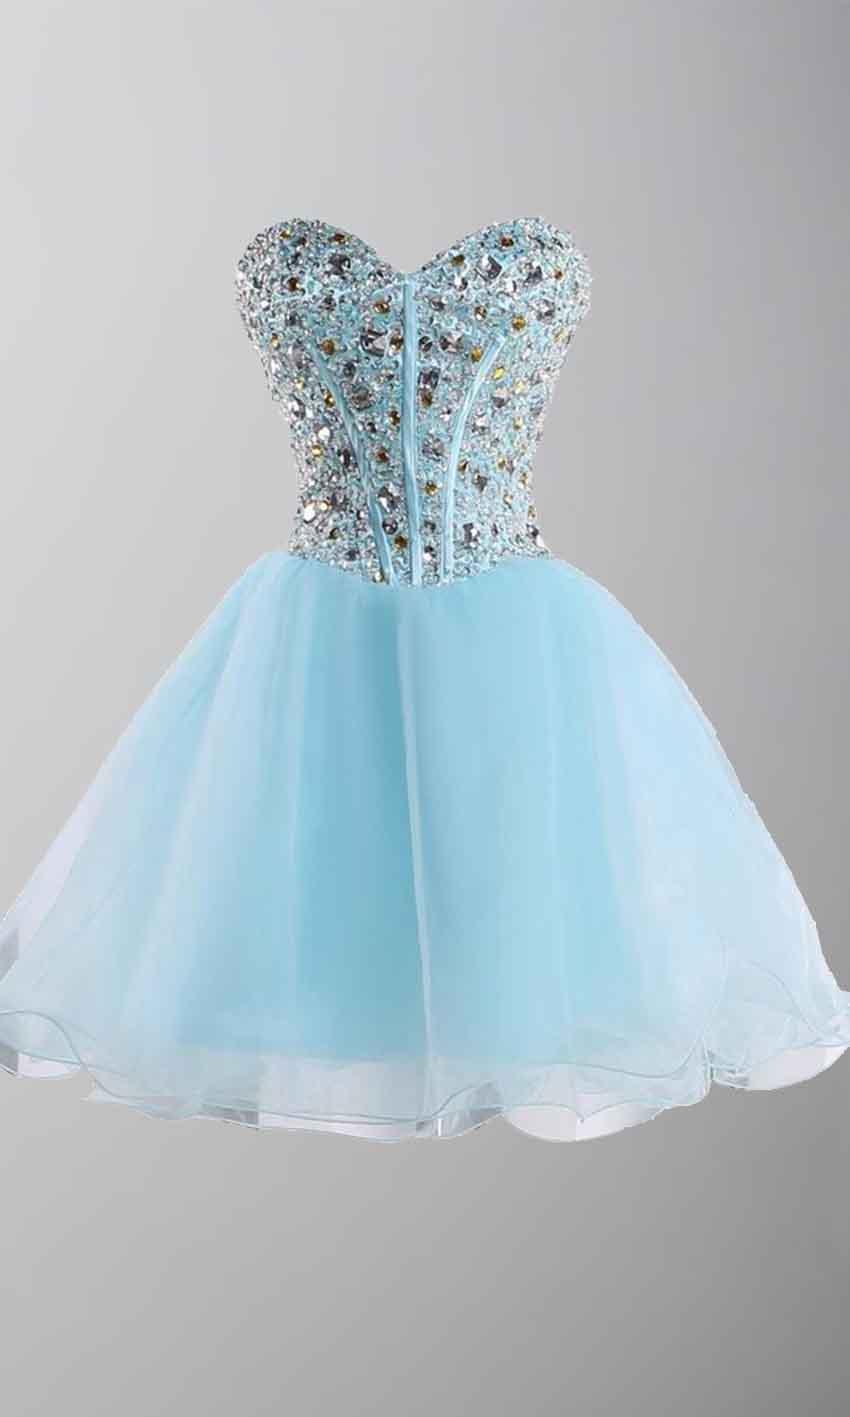 Rhinestone Sweetheart Bodice Short Red Prom Dresses UK KSP403 [KSP403] - £99.00 : Cheap Prom ...